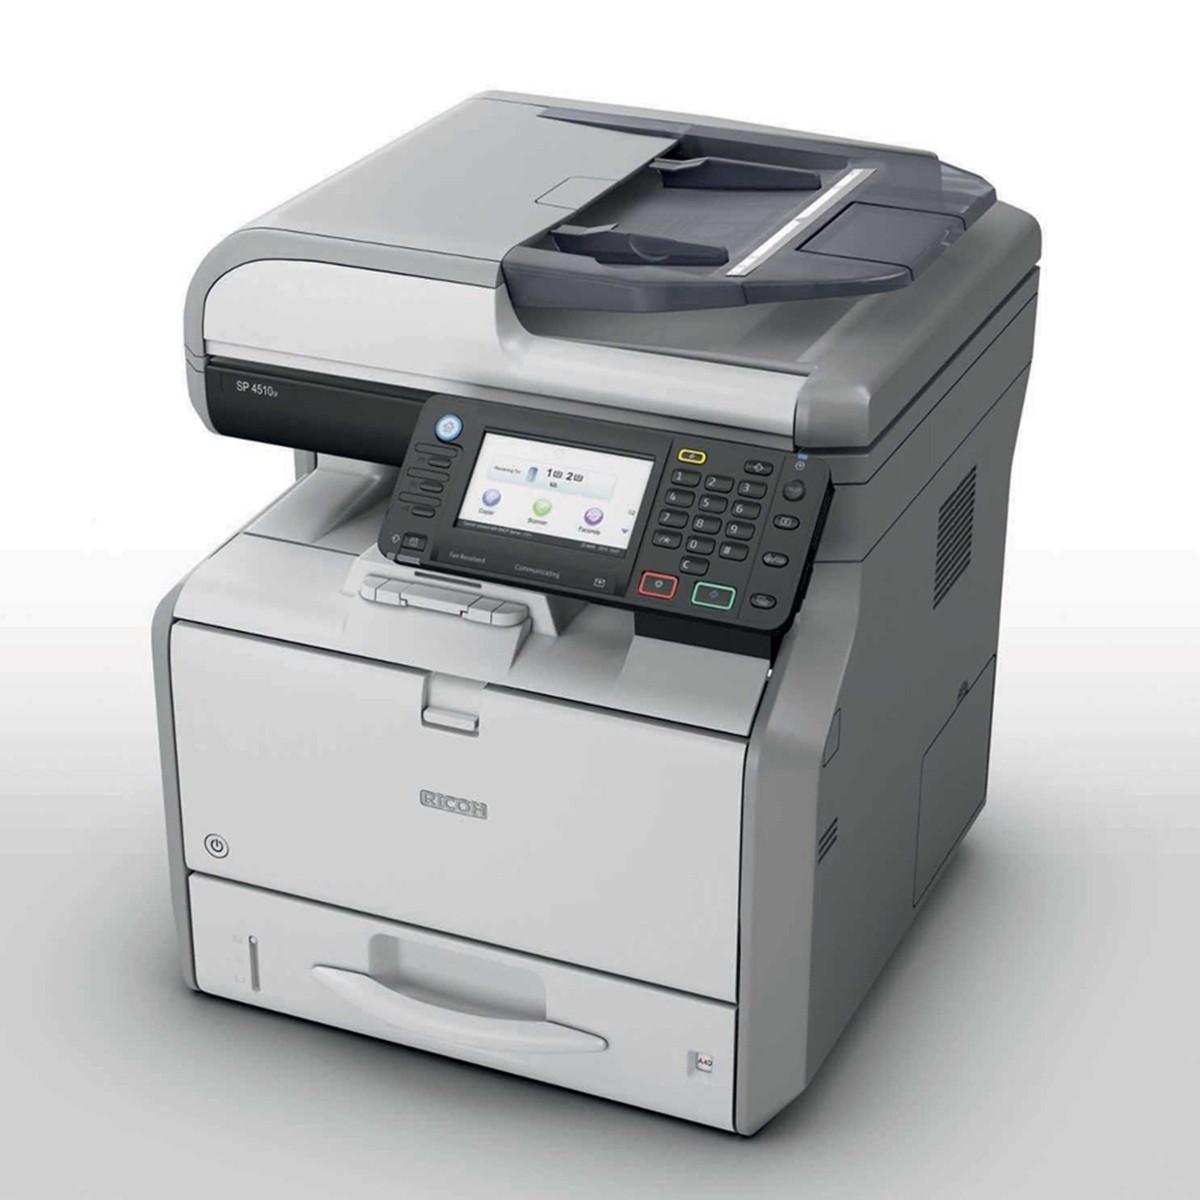 Impressora Ricoh SP 4510SF SP4510 SP-4510 Multifuncional Laser Monocromática